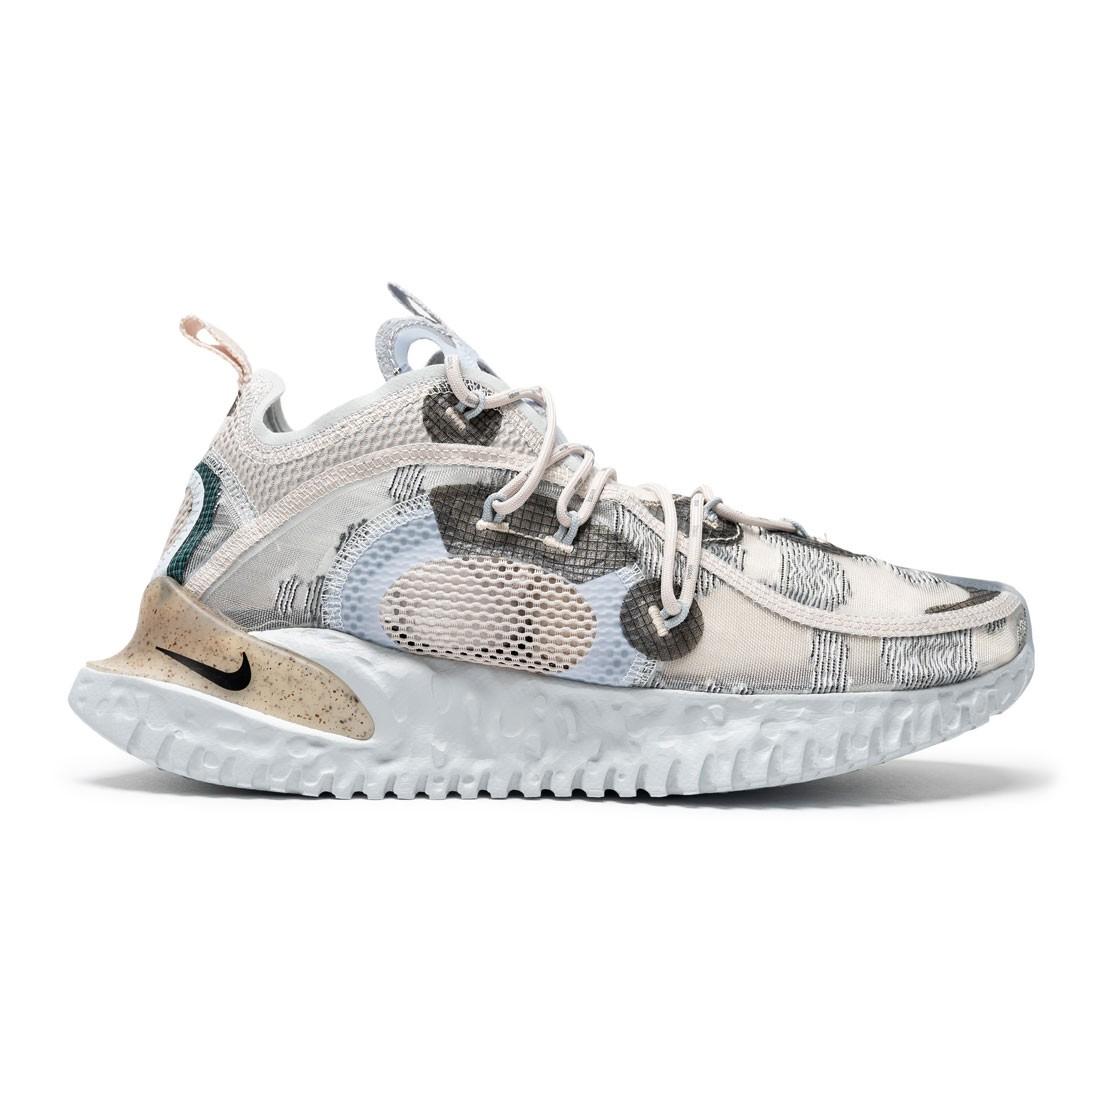 Nike Men Flow 2020 Ispa (pure platinum / black-desert sand)